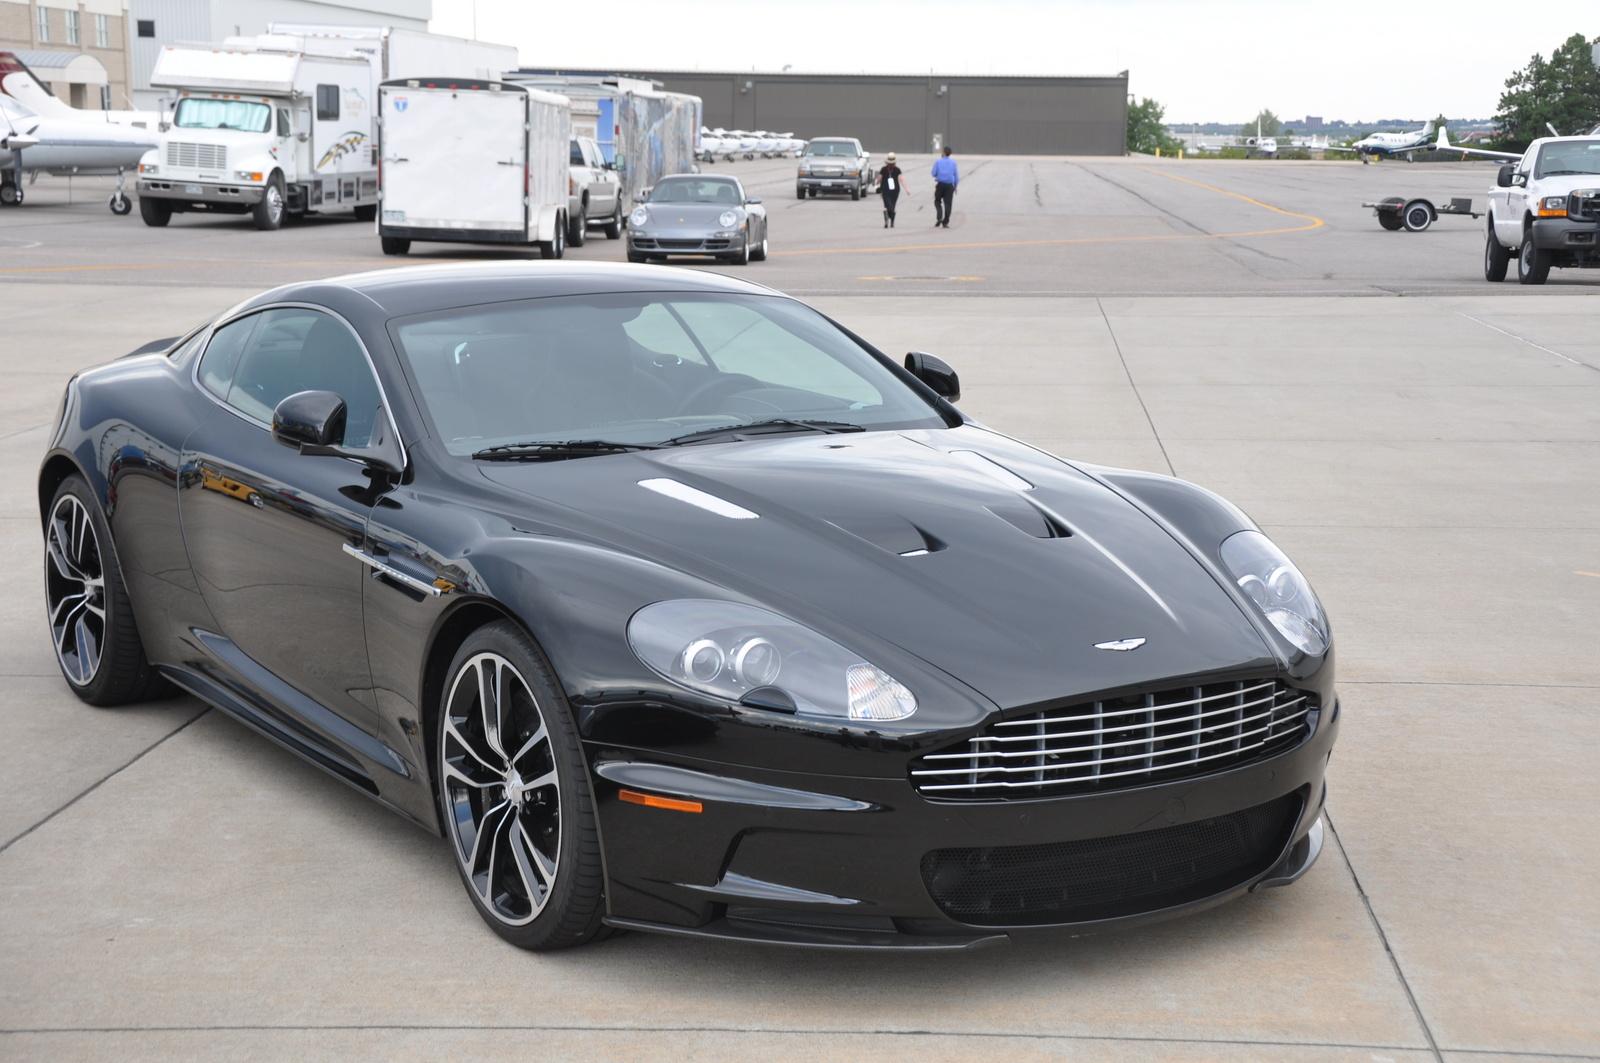 2010 Aston Martin DBS - Information and photos - ZombieDrive